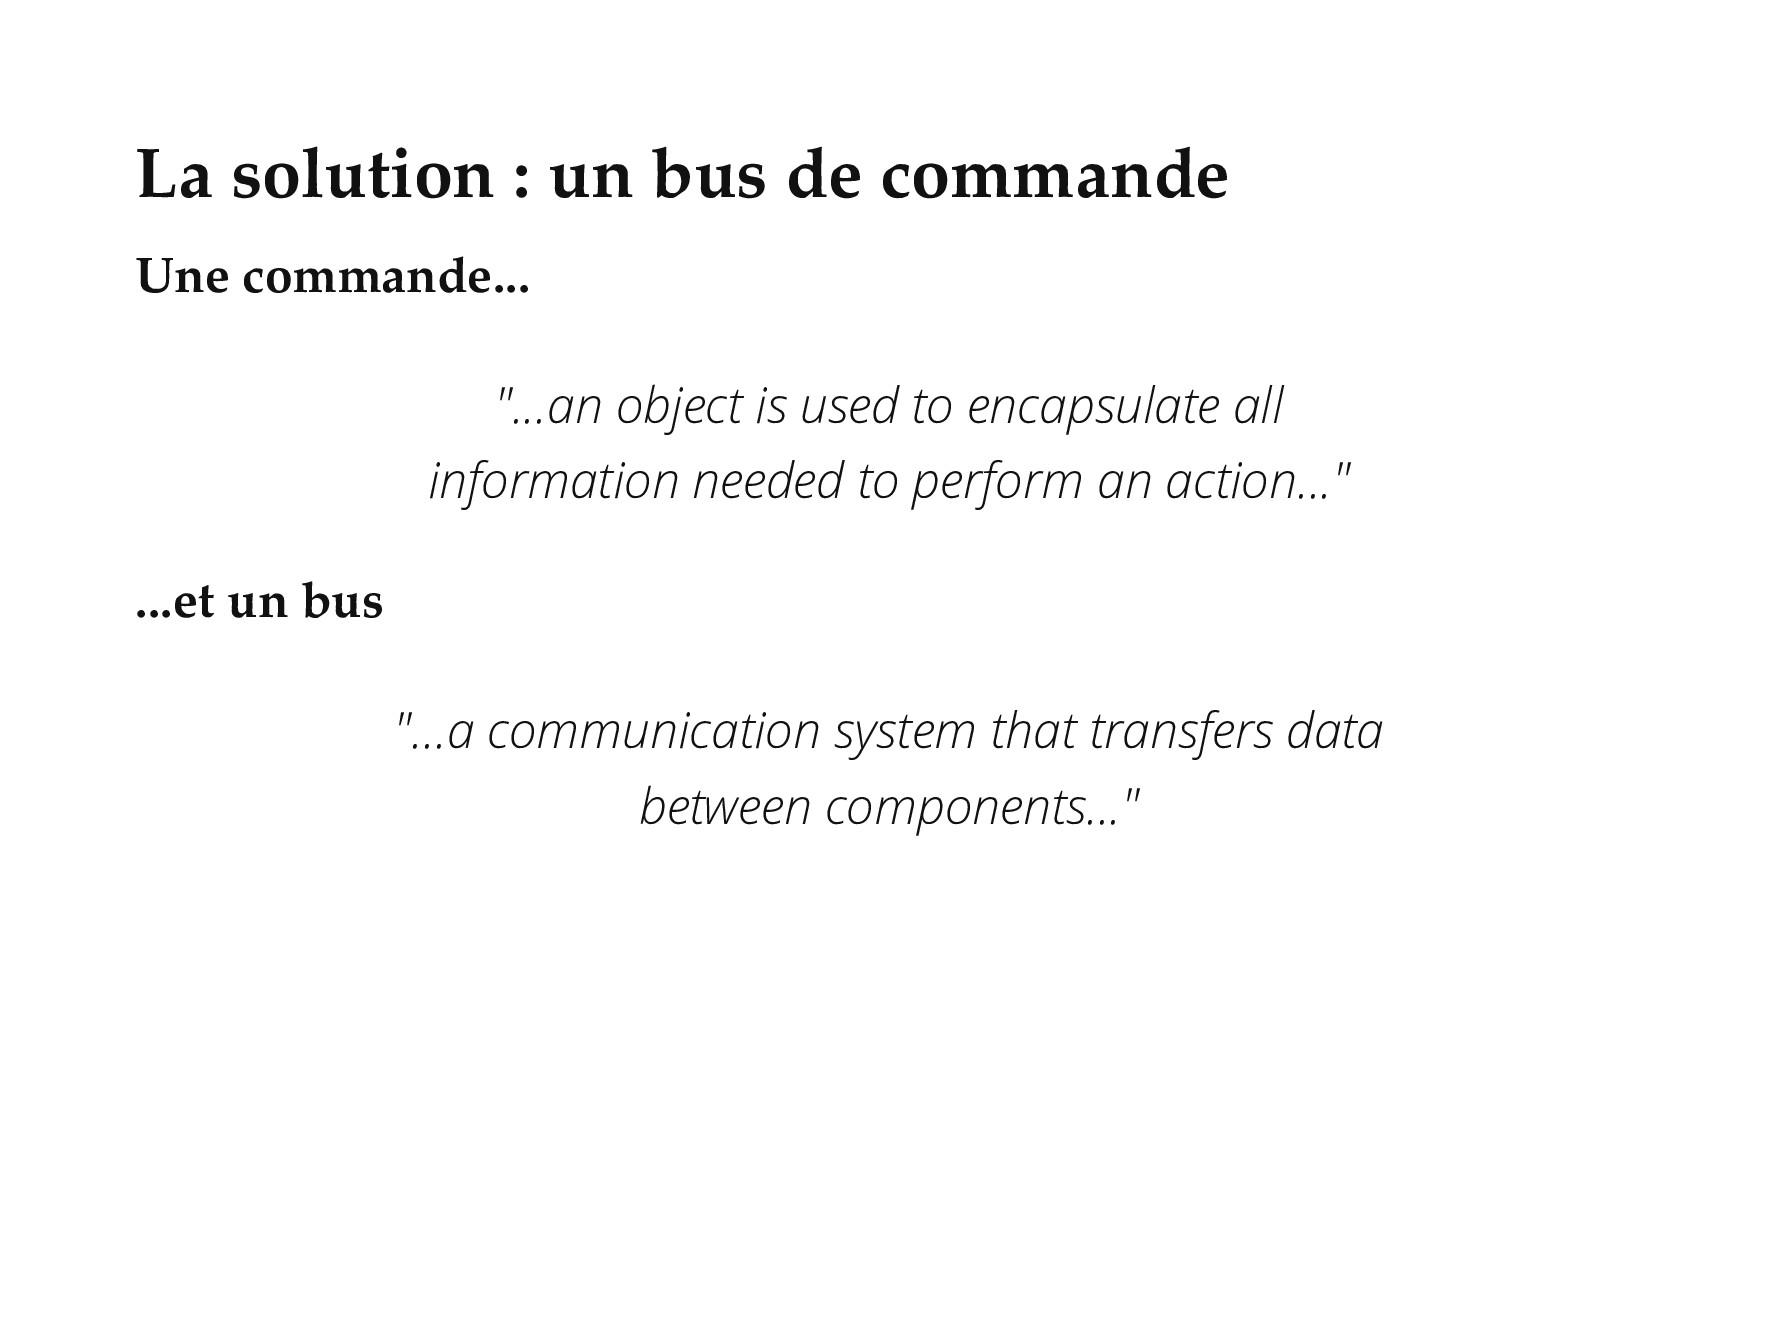 La solution : un bus de commande Une commande.....